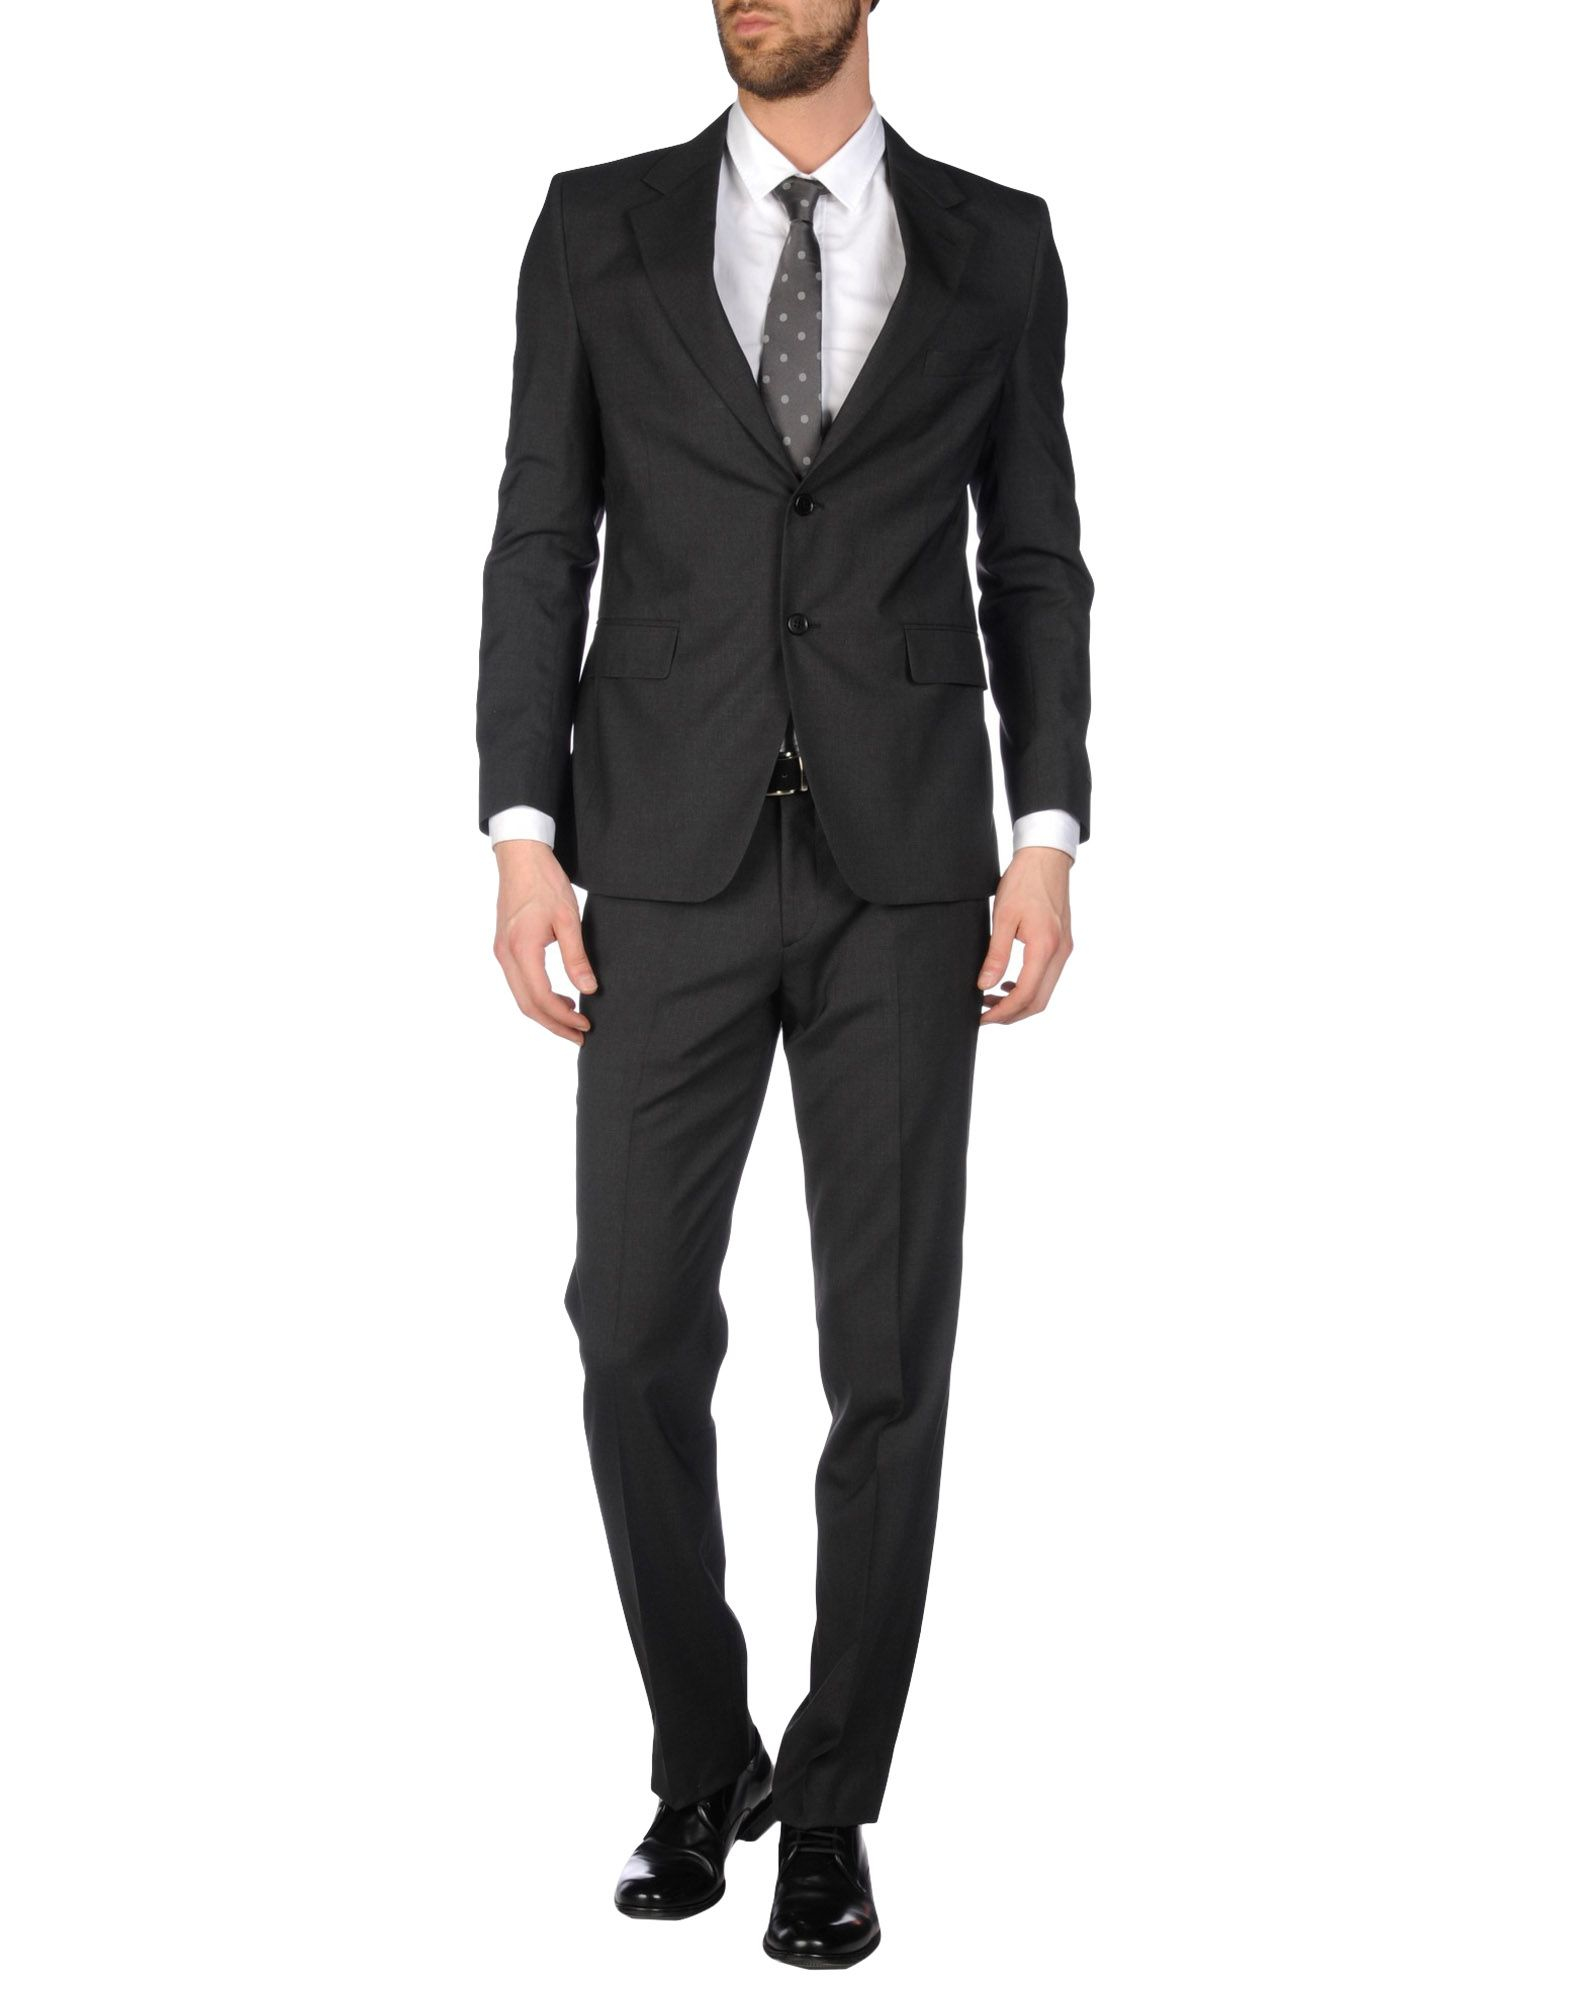 Prada Mens Suits 107